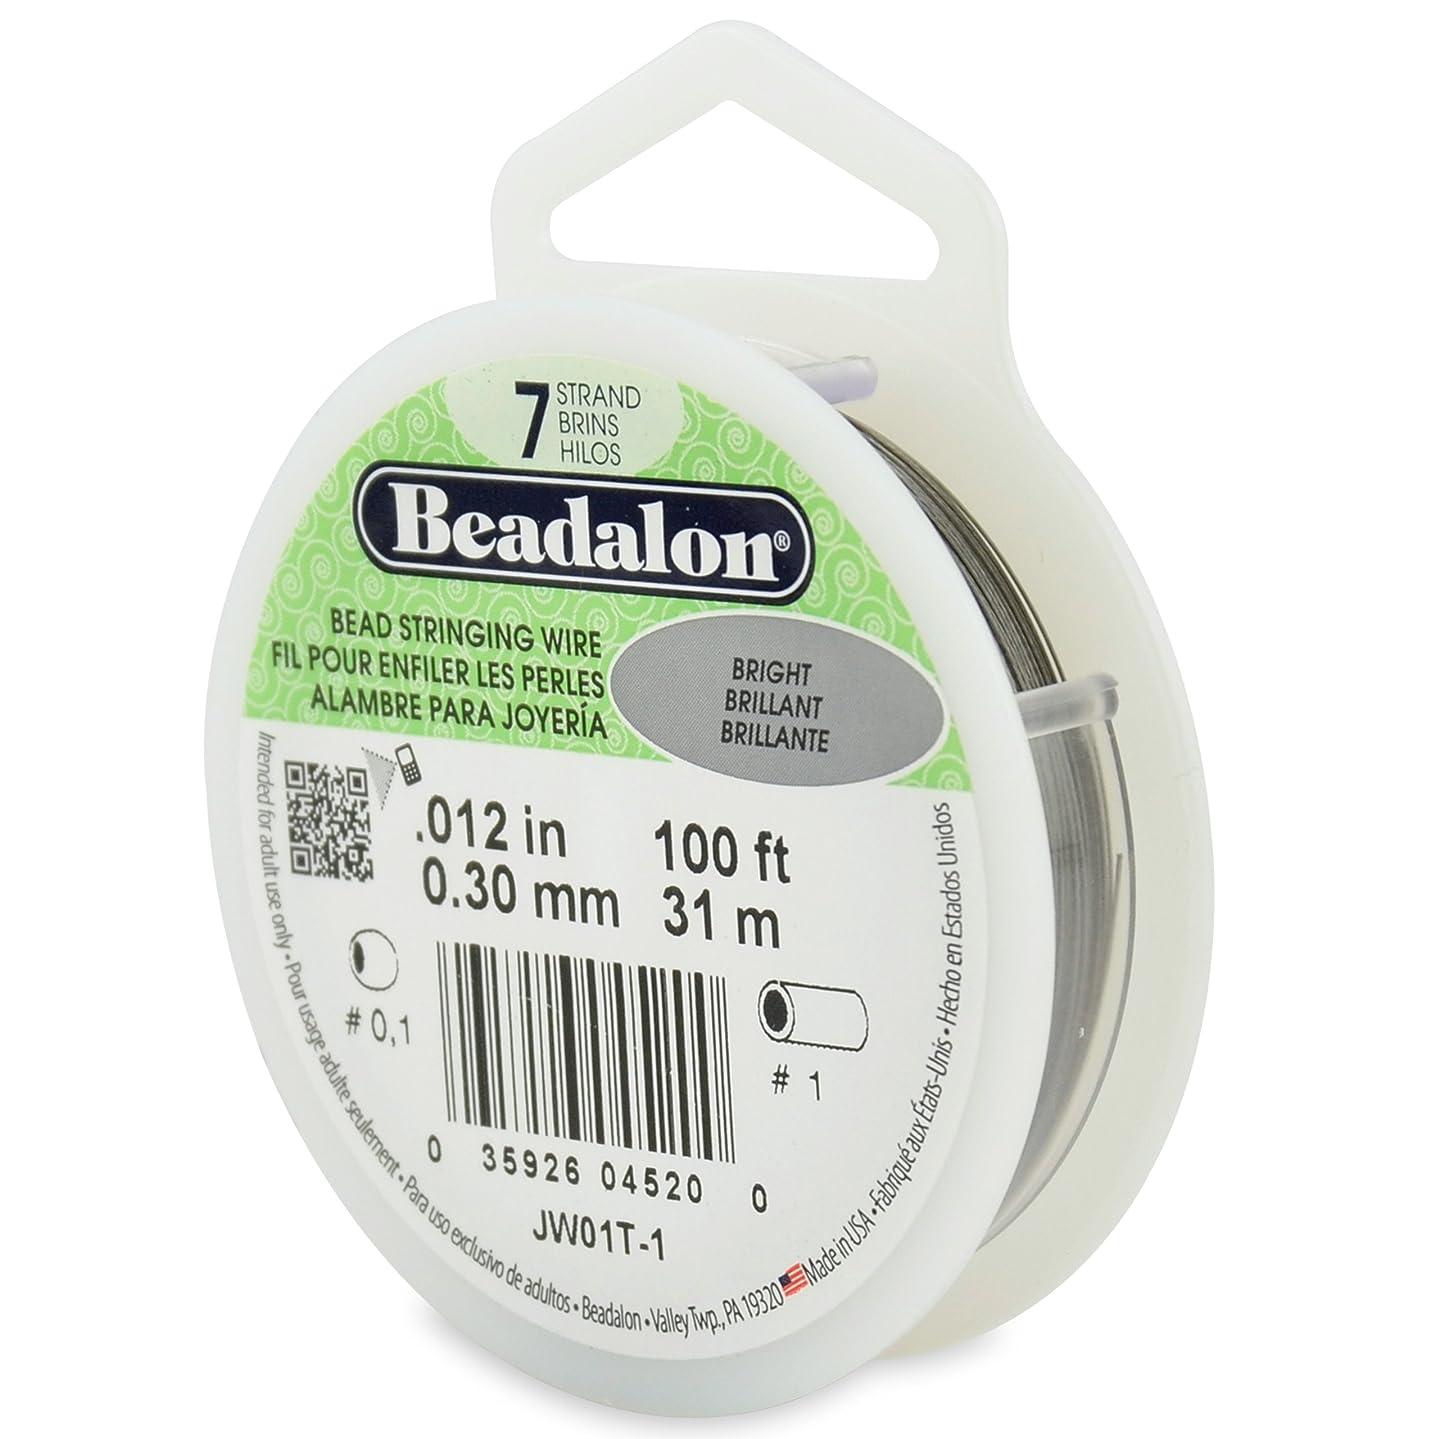 Beadalon 7-Strand 0.012